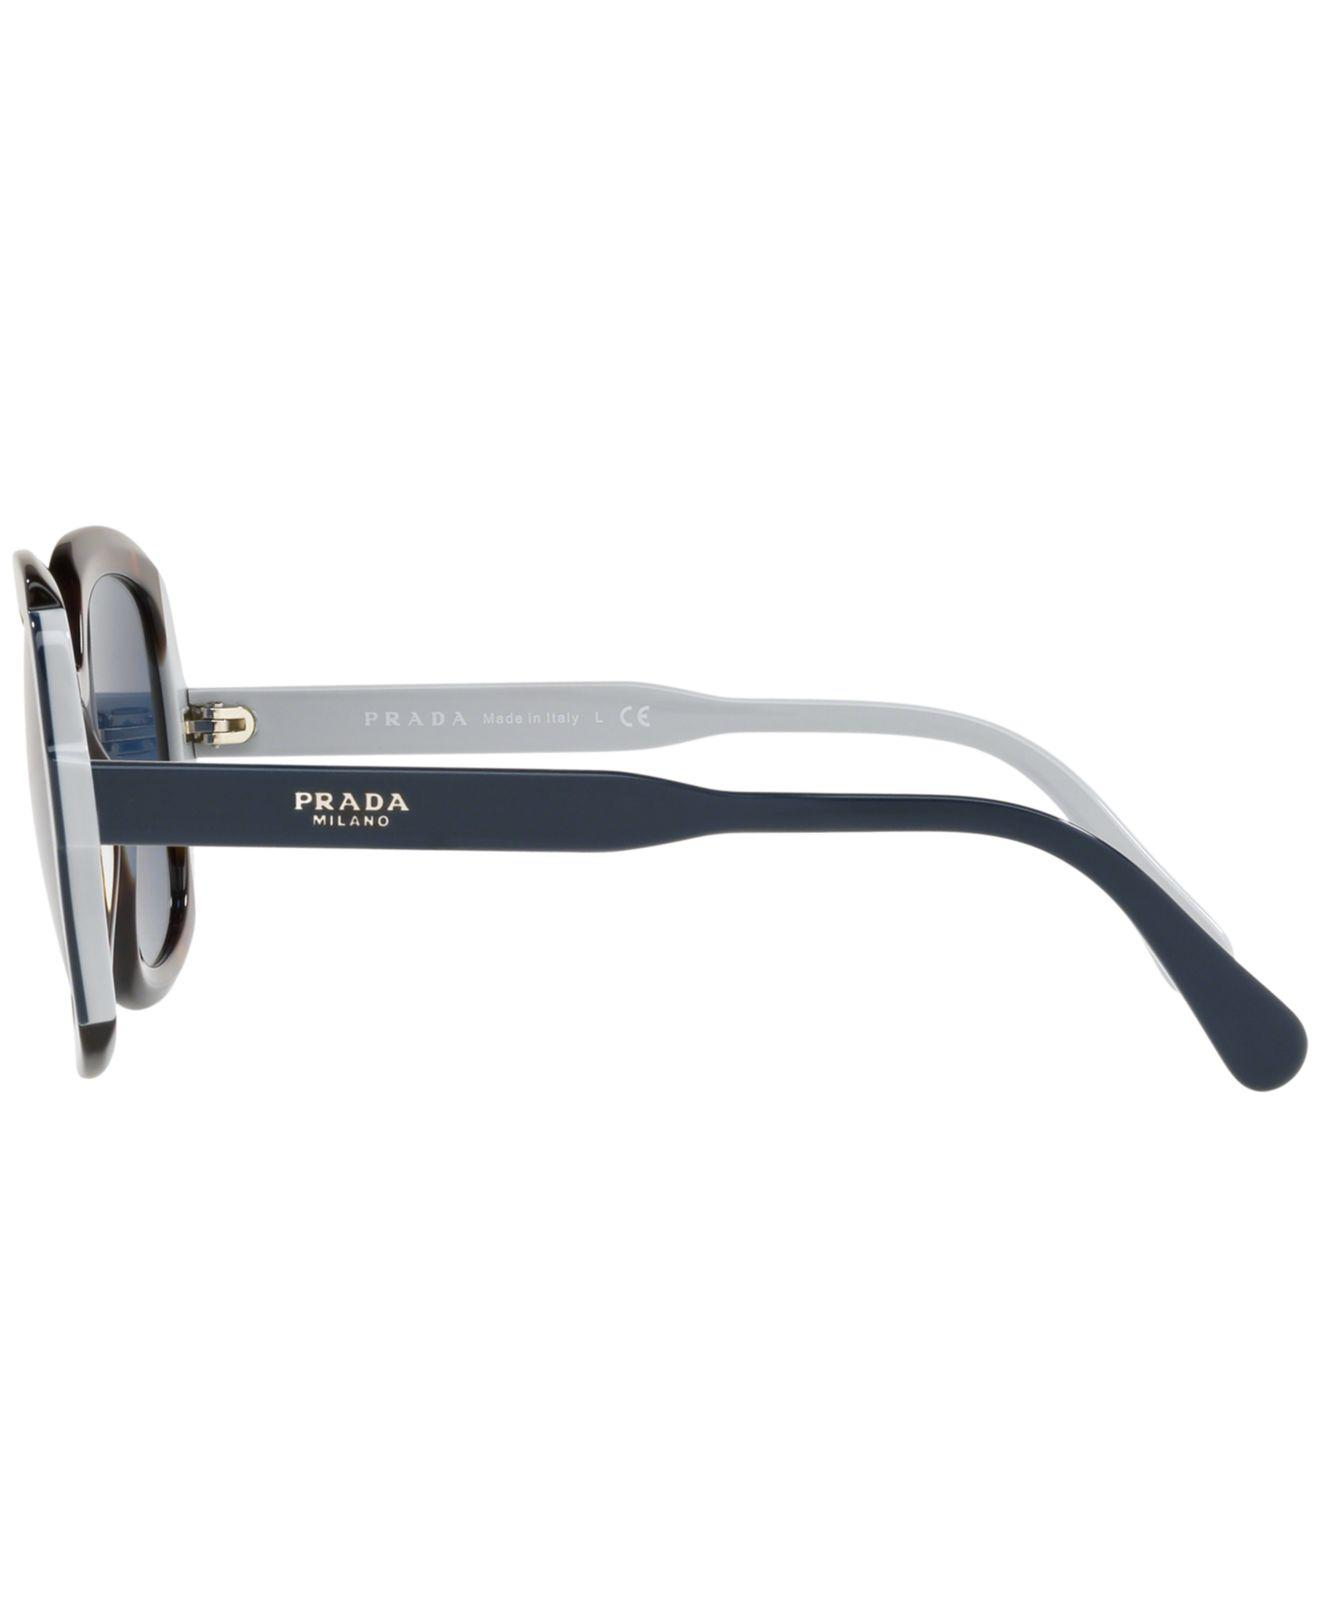 6d1ac6c34e18 Lyst - Prada Sunglasses